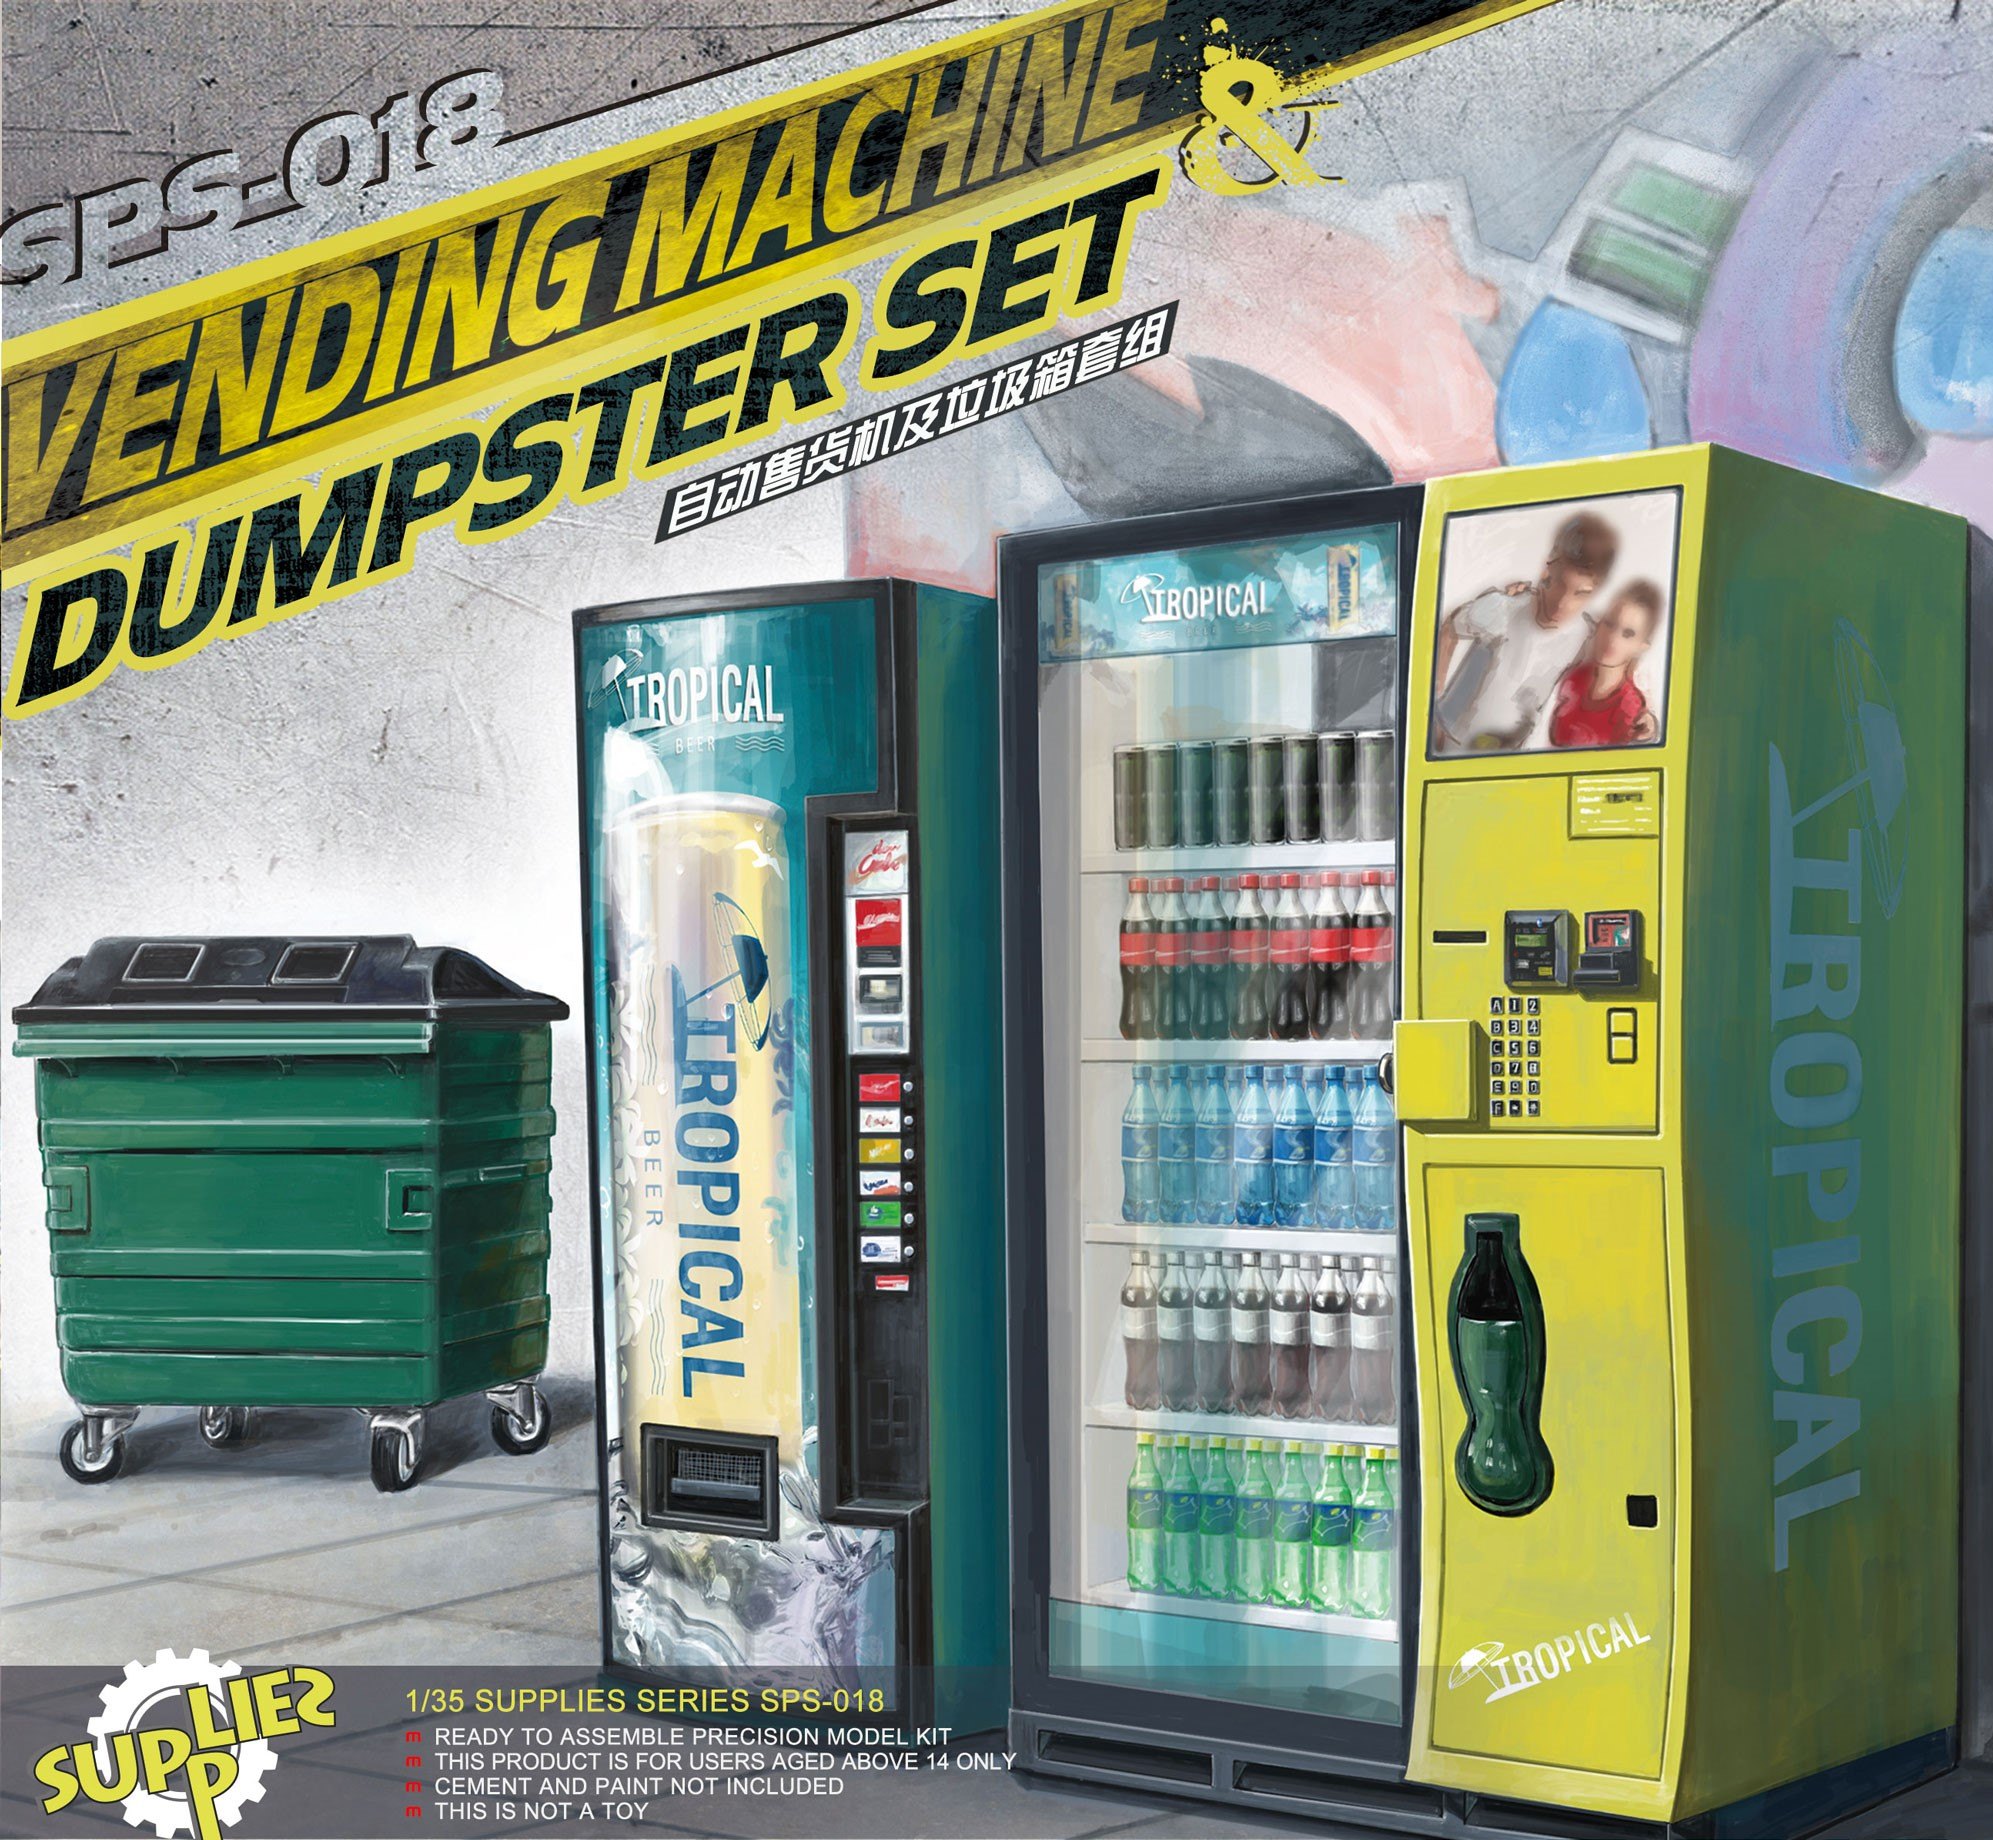 Meng Vending Machine & Dumpster Set